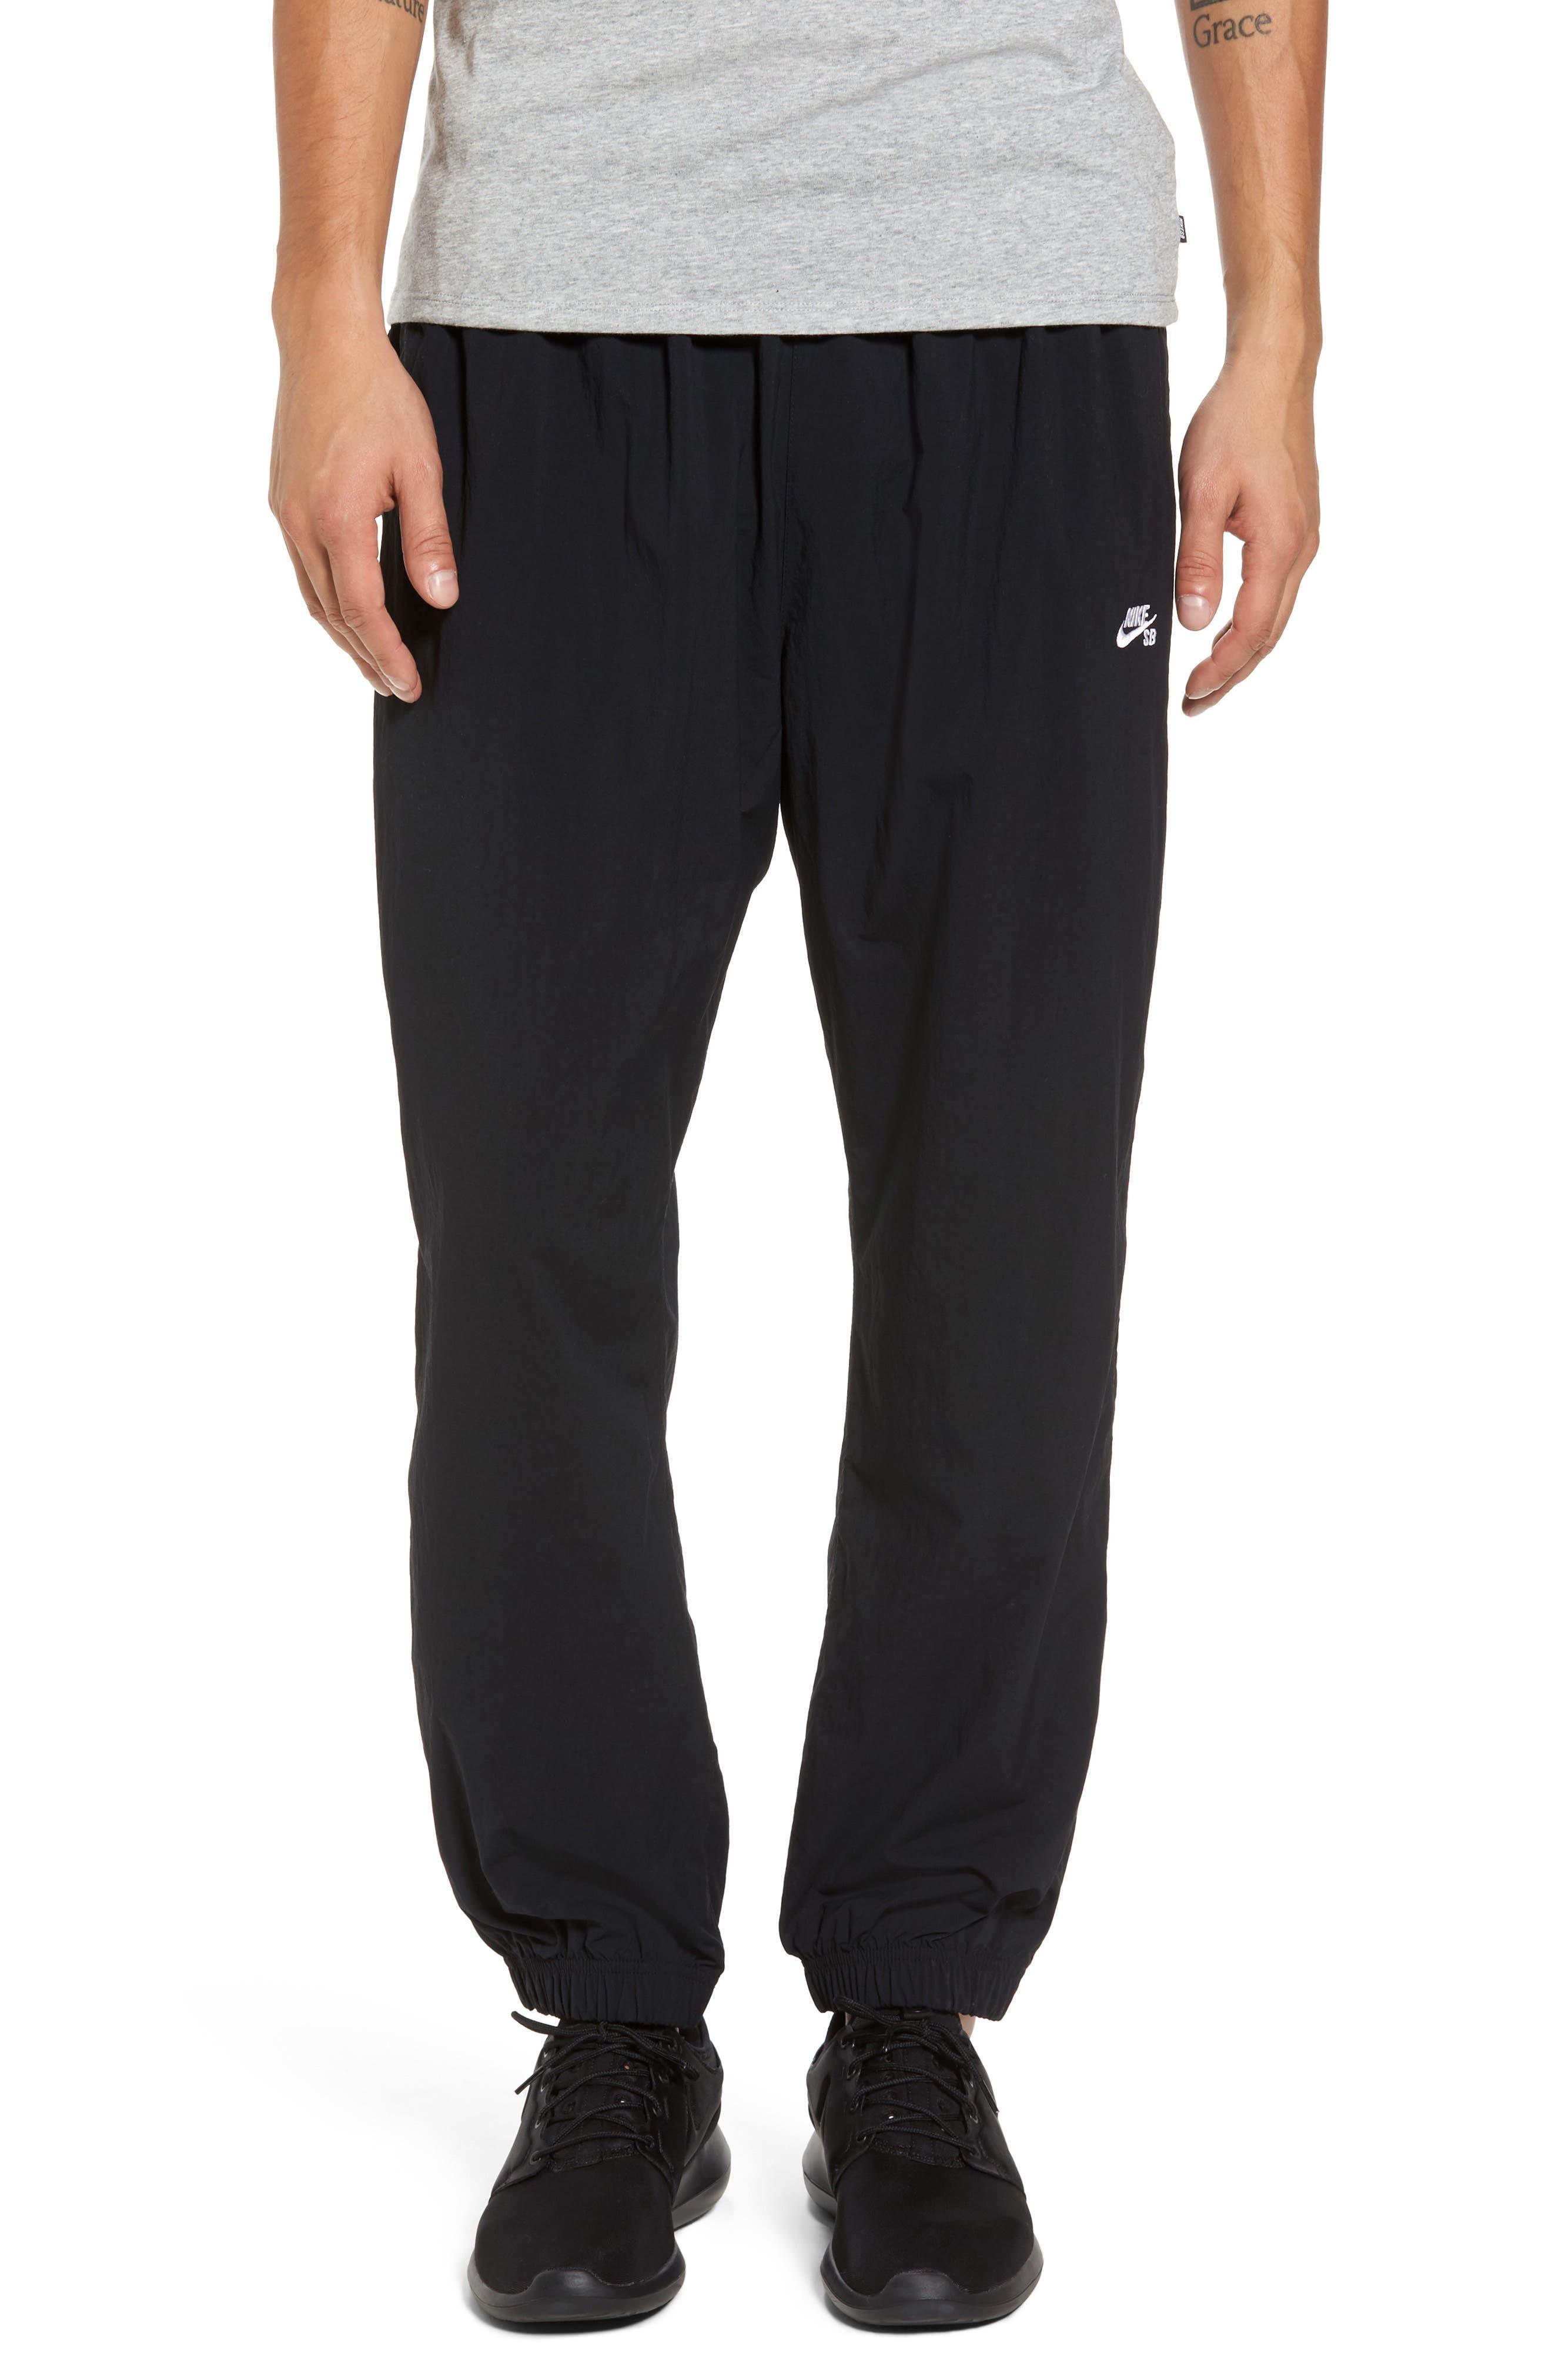 Flex Woven Pants,                             Main thumbnail 1, color,                             Black/ White